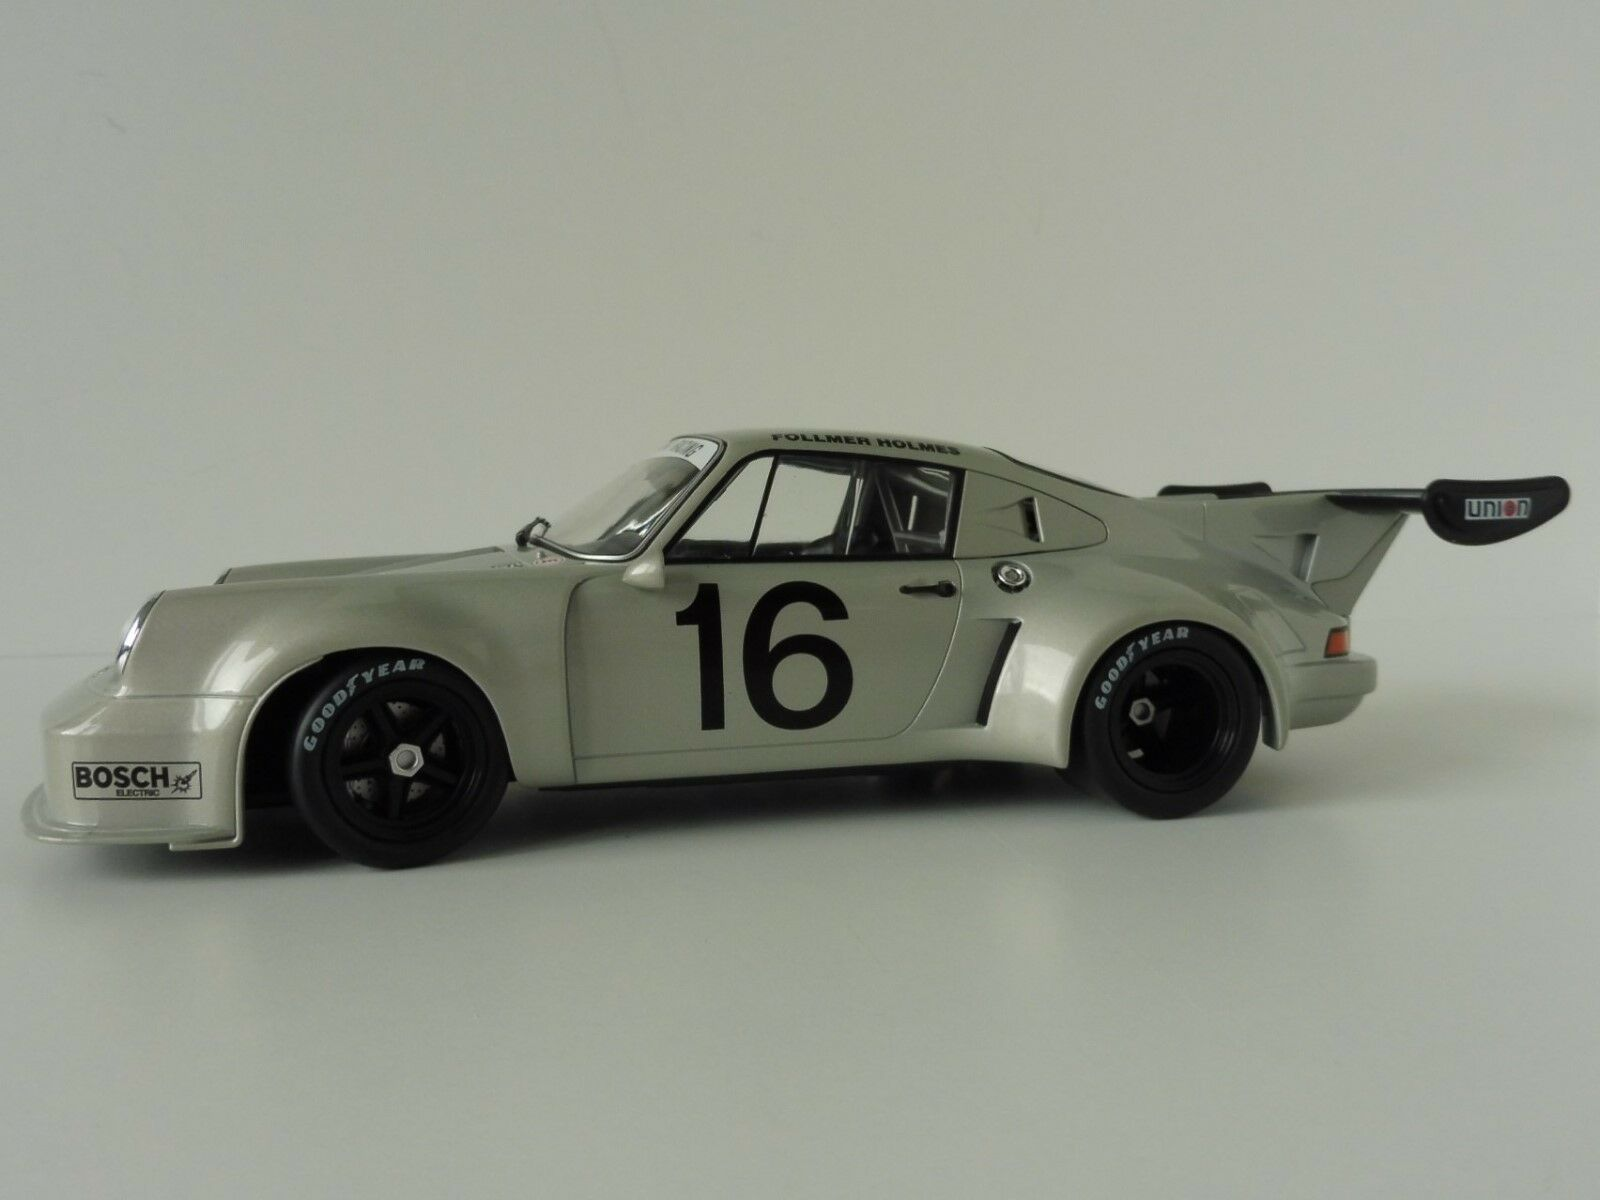 PORSCHE 911 Carrera RSR Mid-Ohio 3 hours 1977 1 18 NOREV 187427 Follmer Holmes